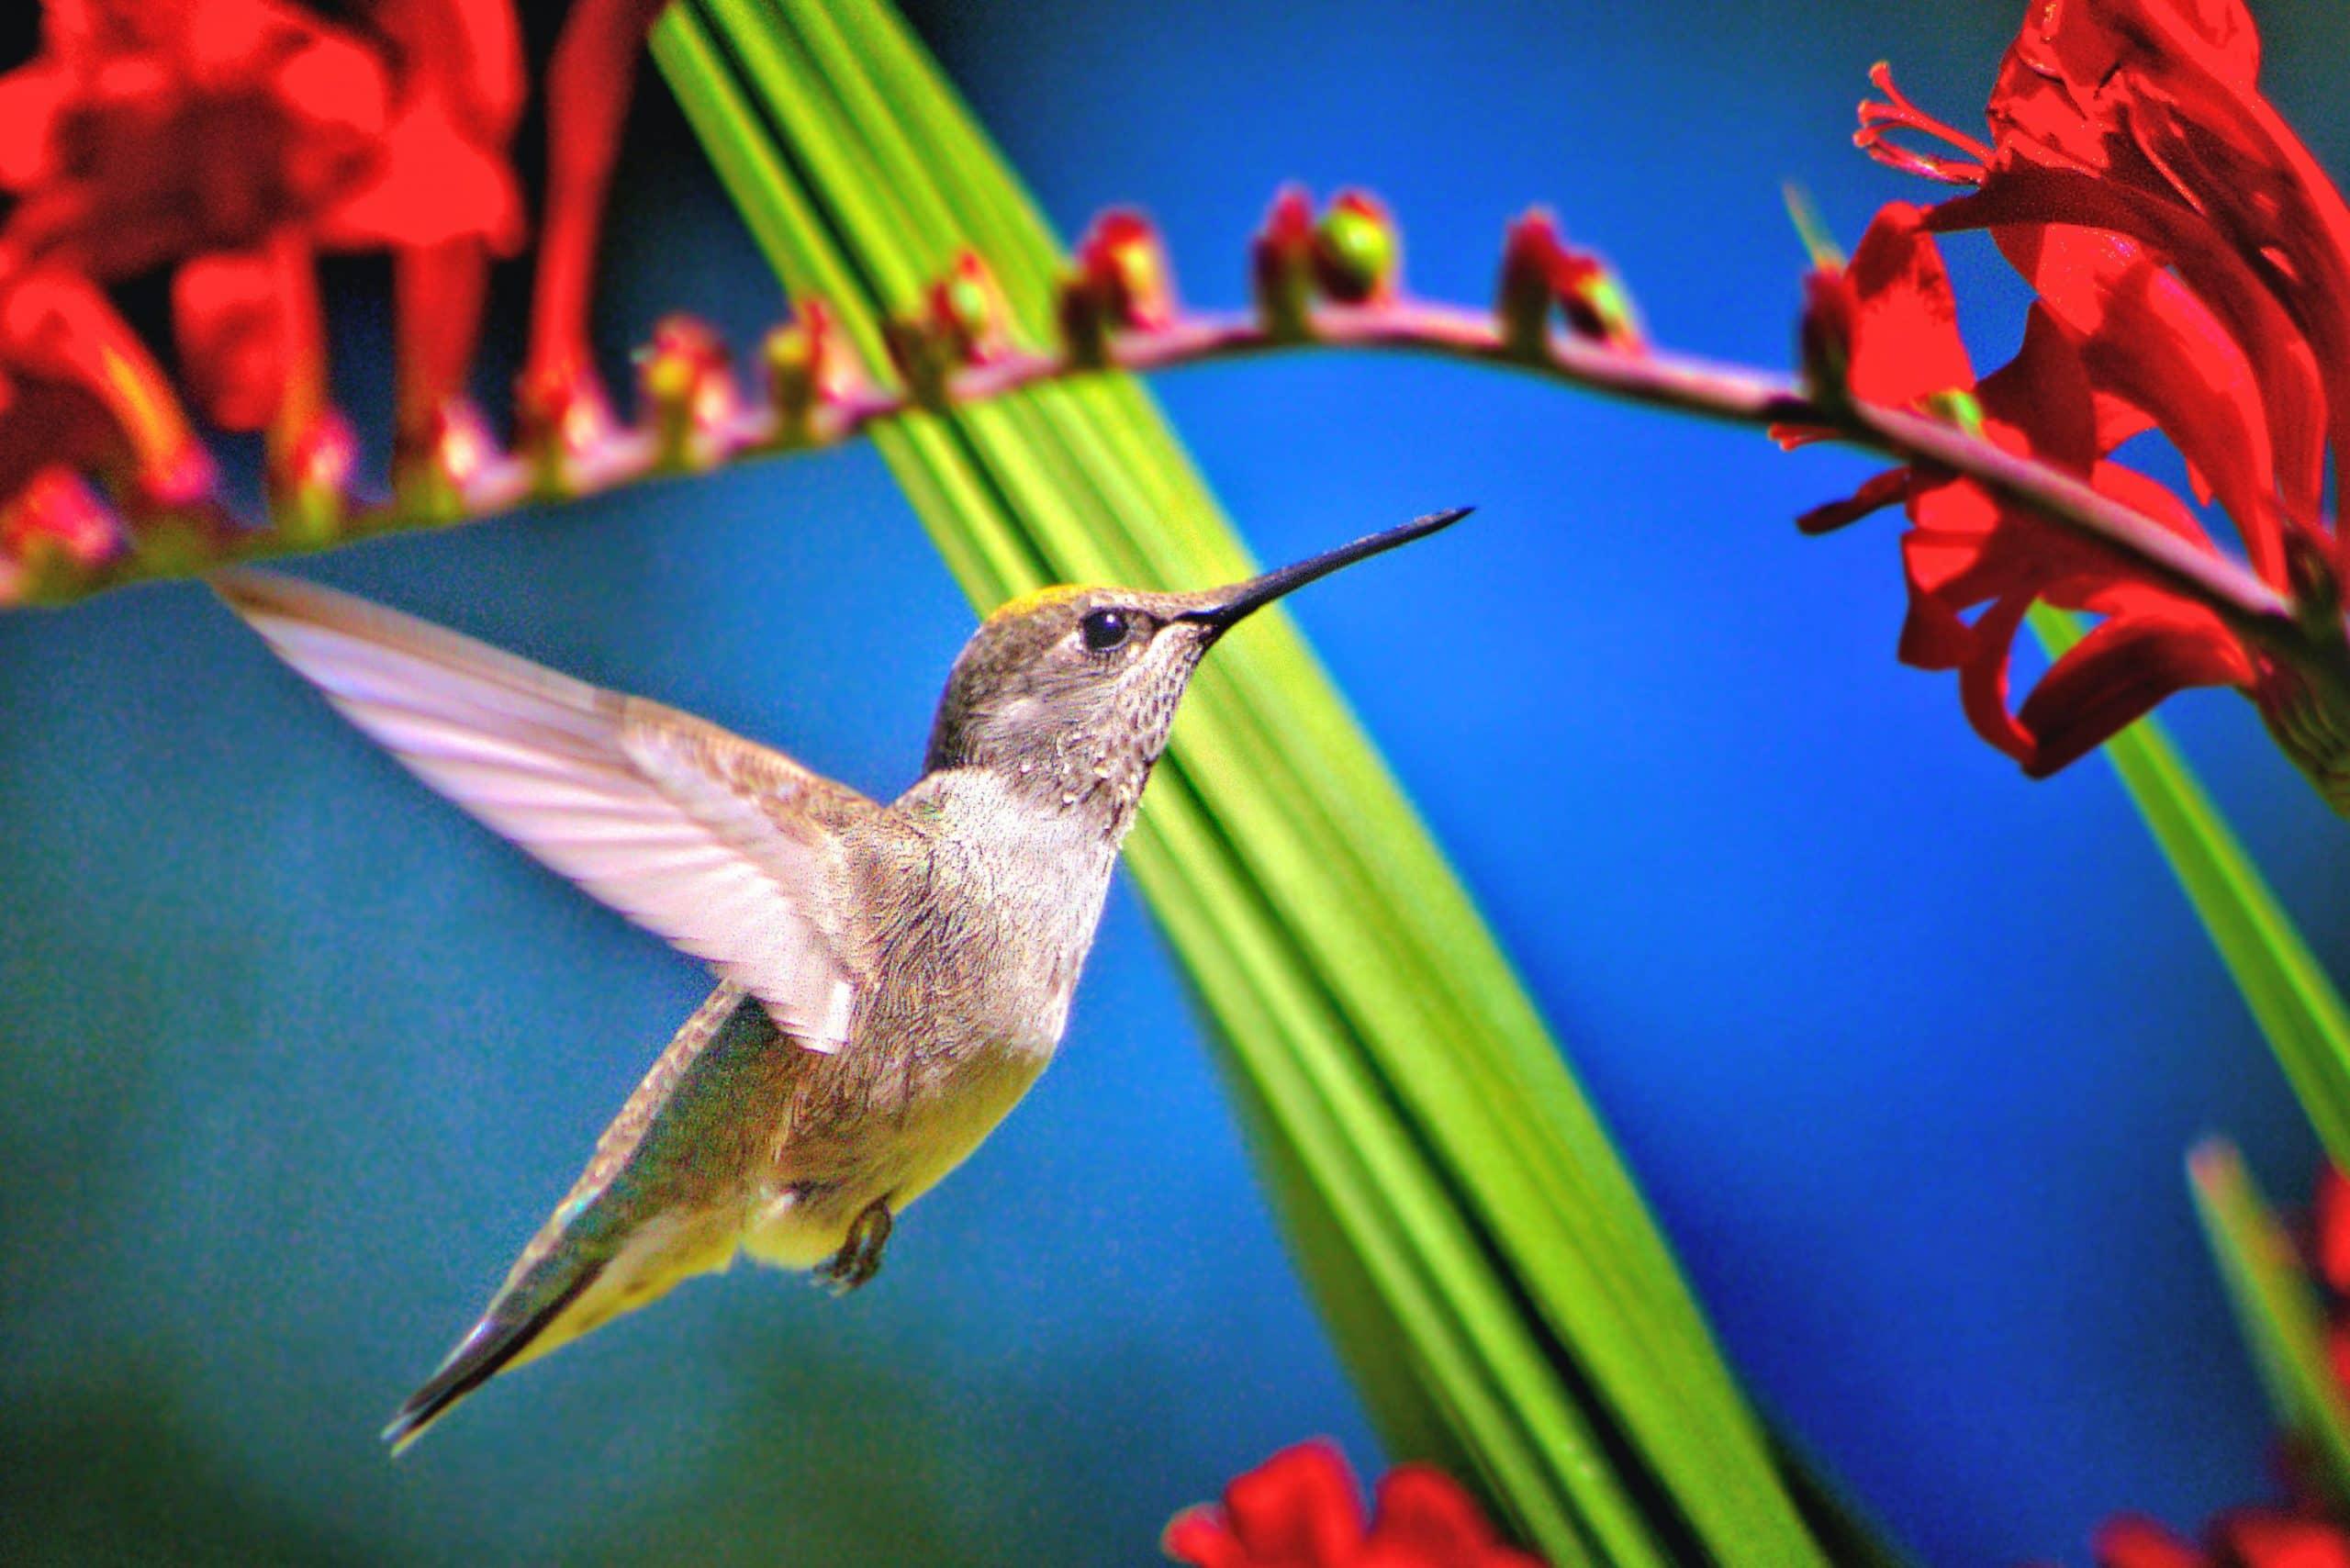 How to photograph a Hummingbird